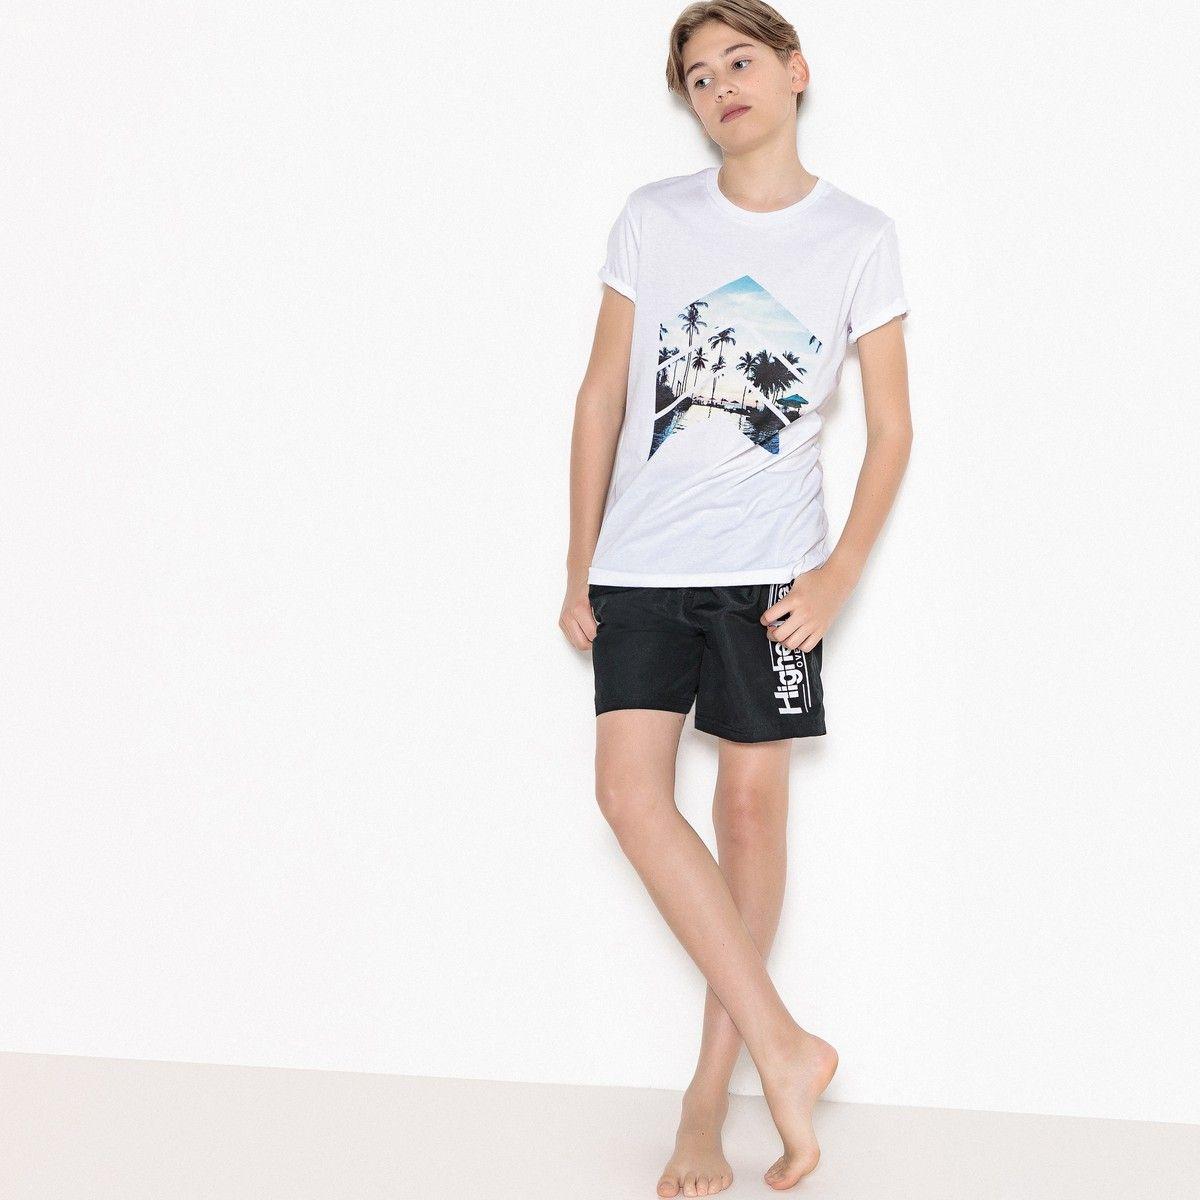 4664078d236a Printed Cotton T-Shirt